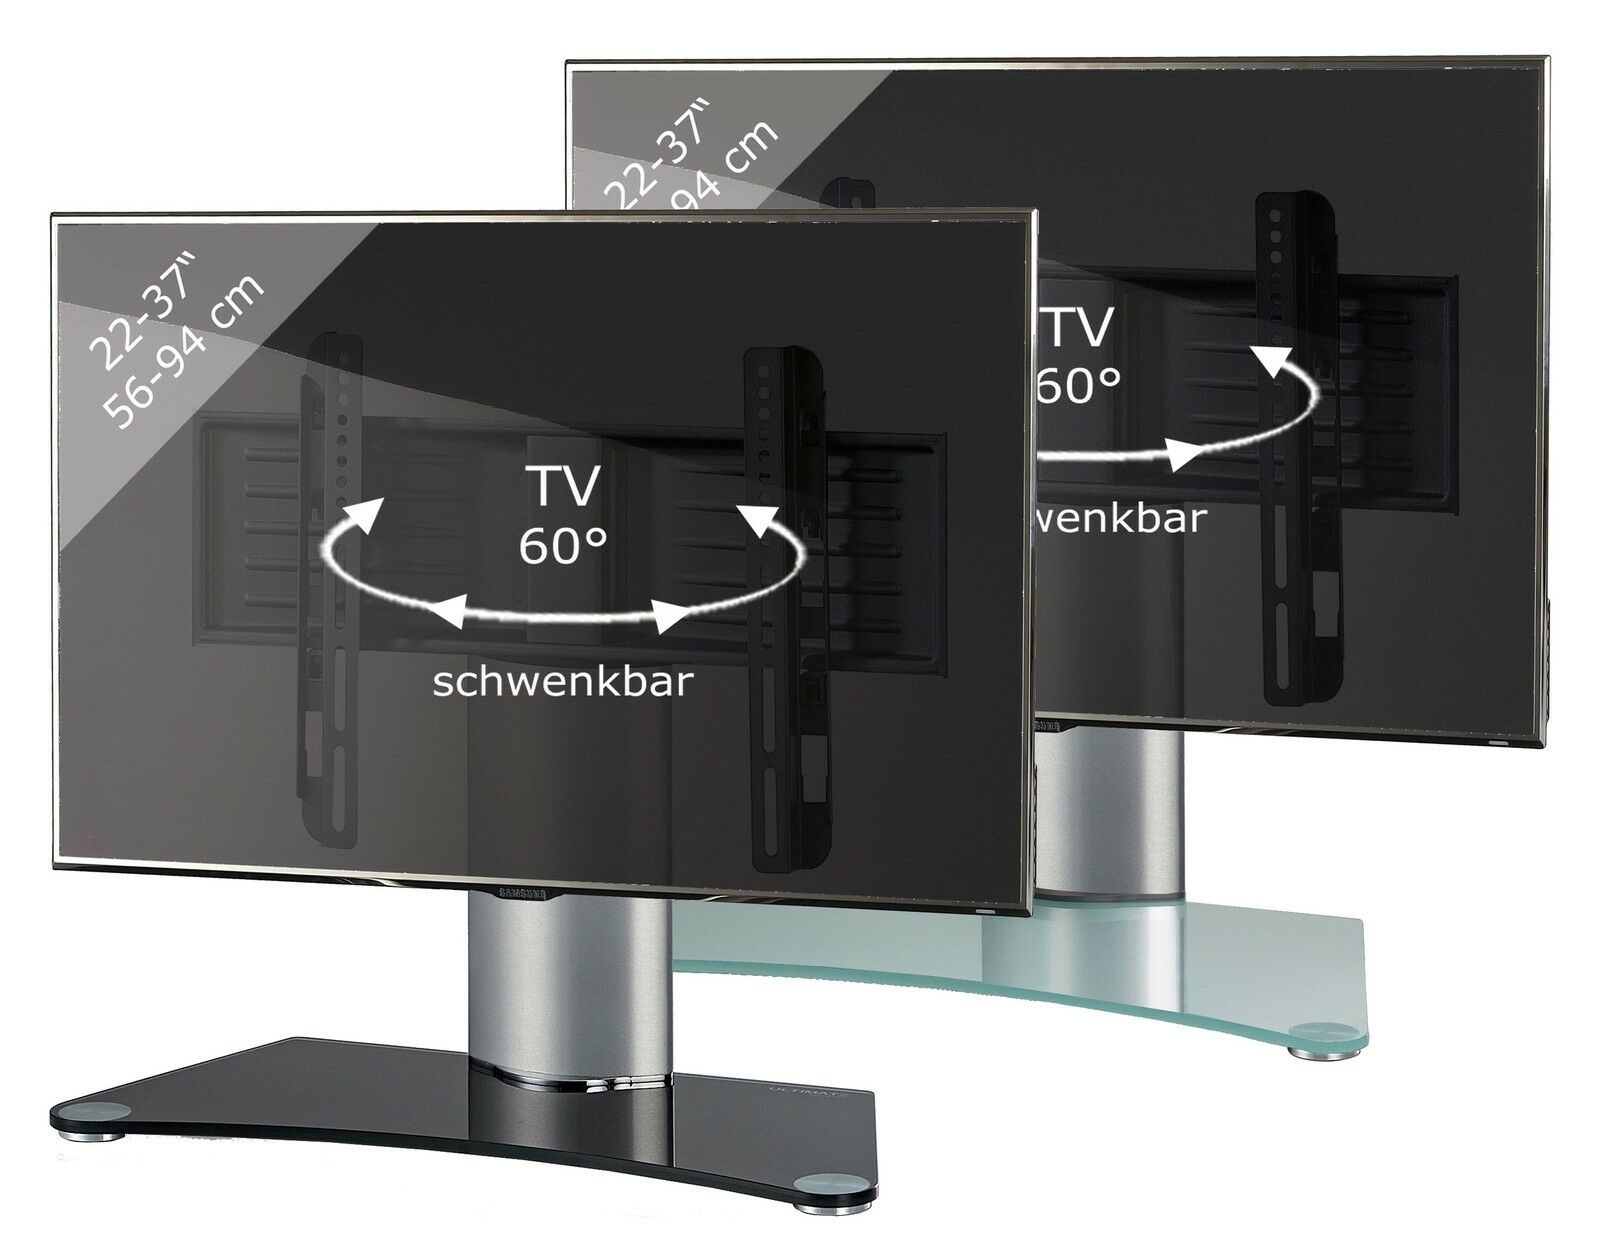 VCM TV-Standfuß Tischfuß TV TV TV Fernseh Aufsatz Fuß Erhöhung schwenkbar drehbar 4bdeb5